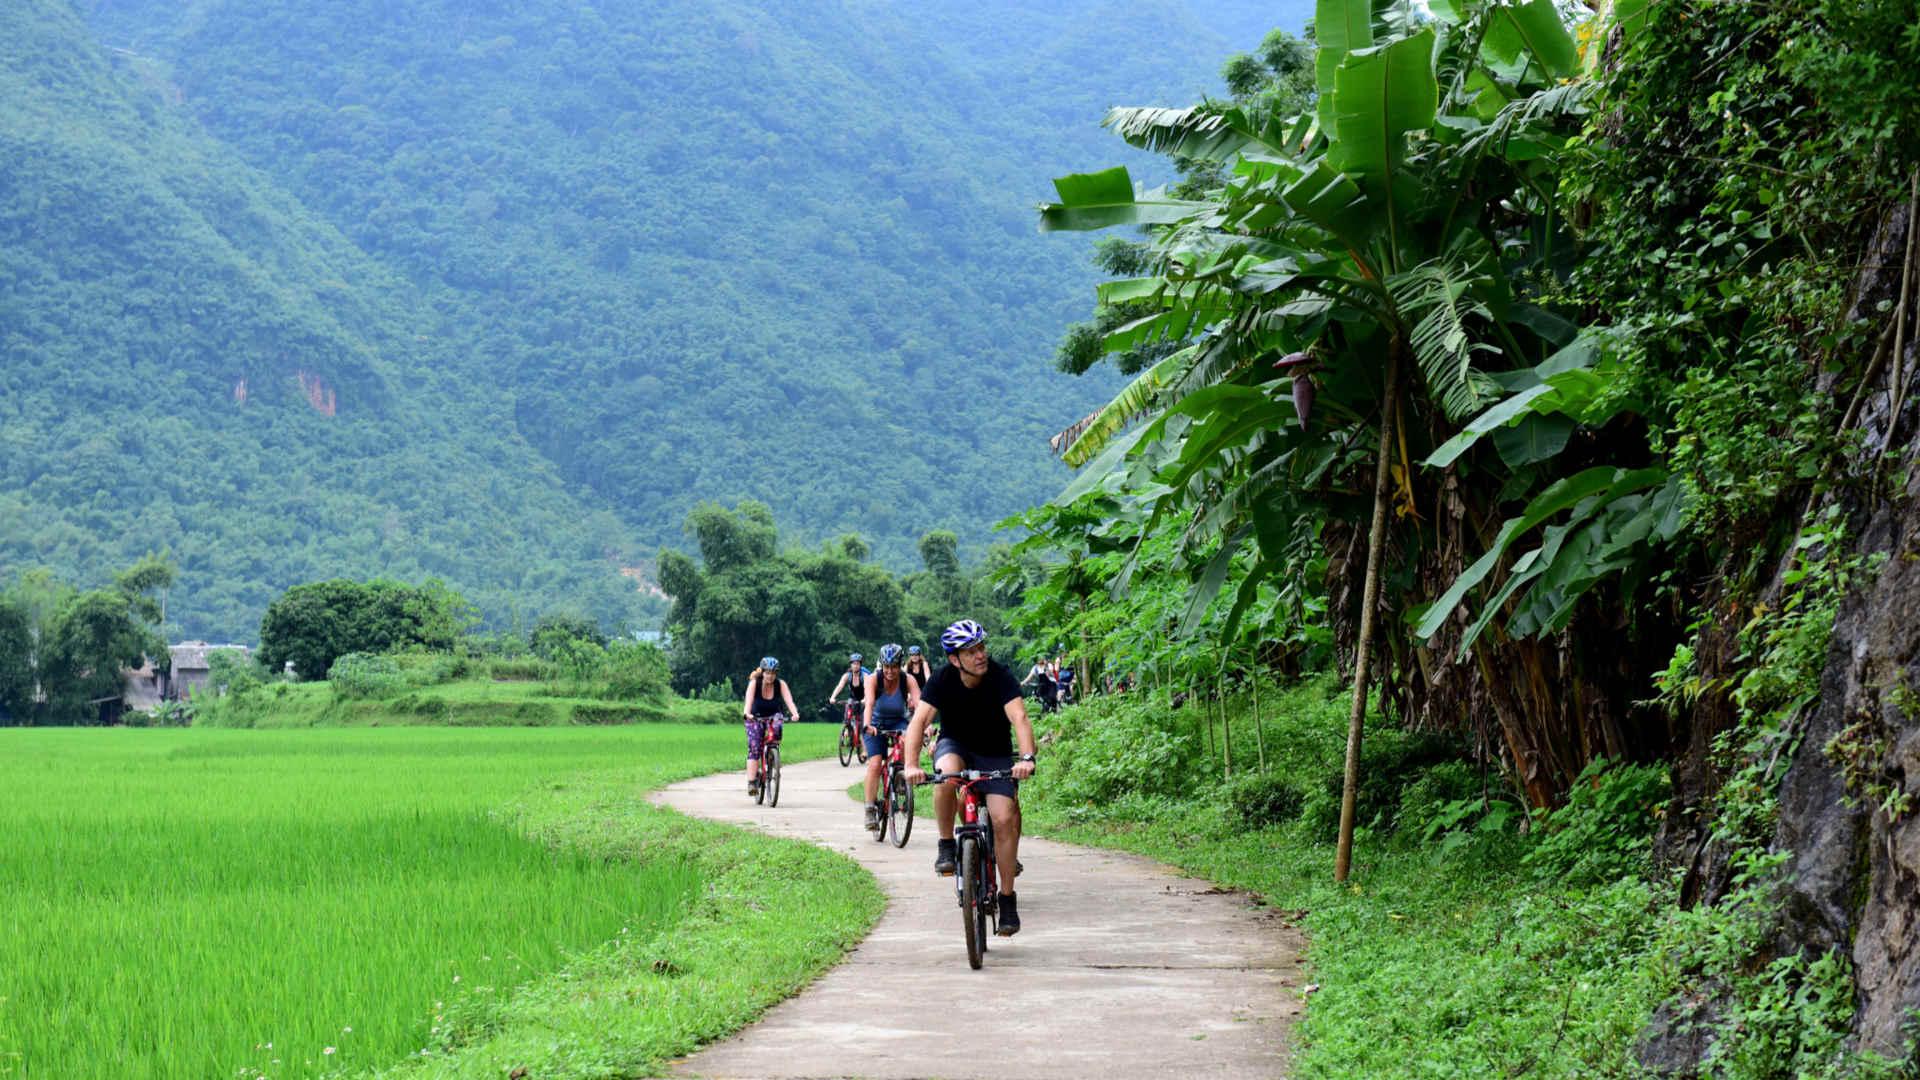 Go-Indochine cycling tour Mai Chau Vietnam